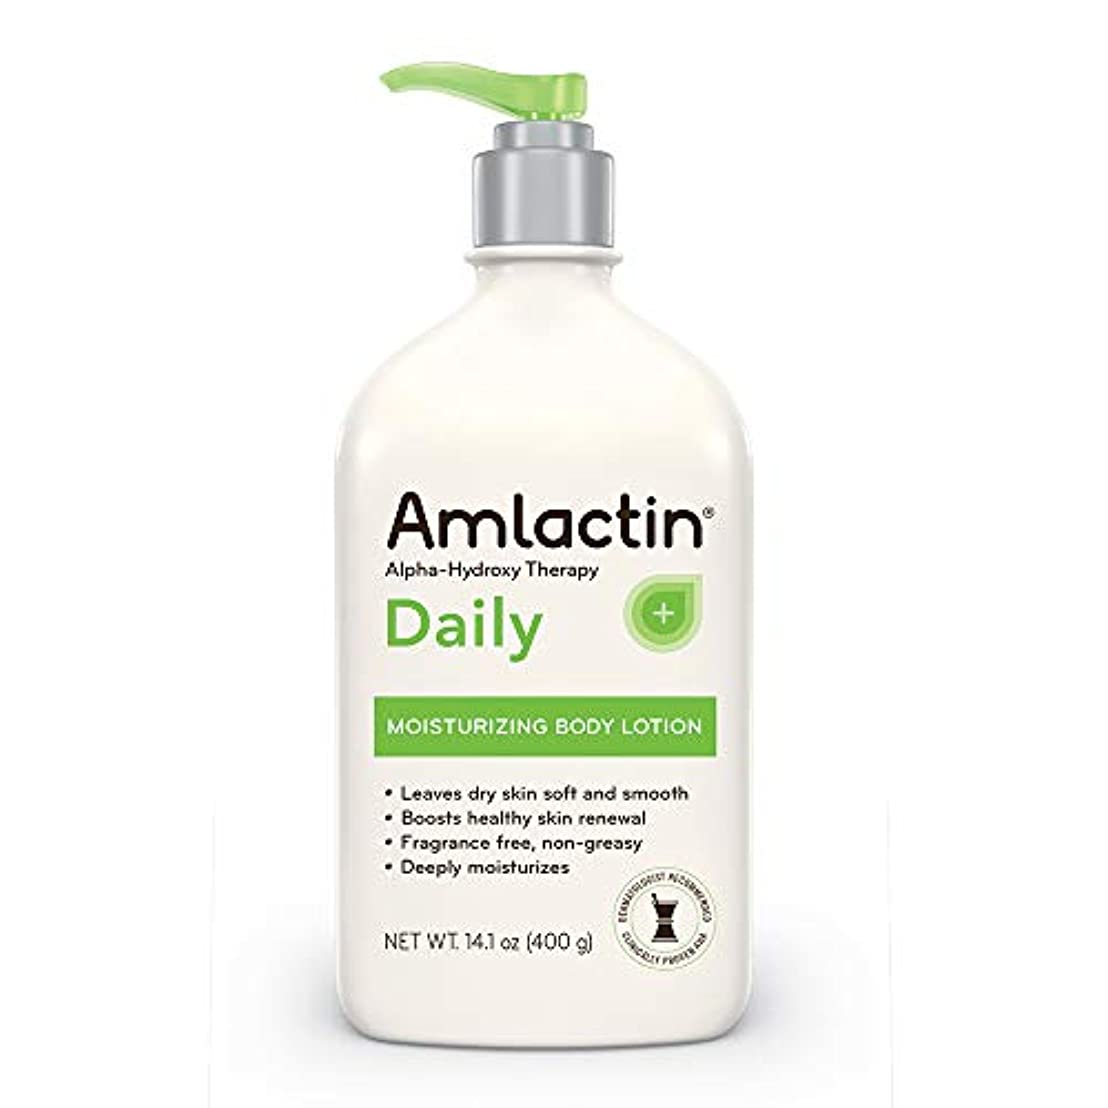 AmLactin 12% Moisturizing Lotion - 14 oz (400 gm)